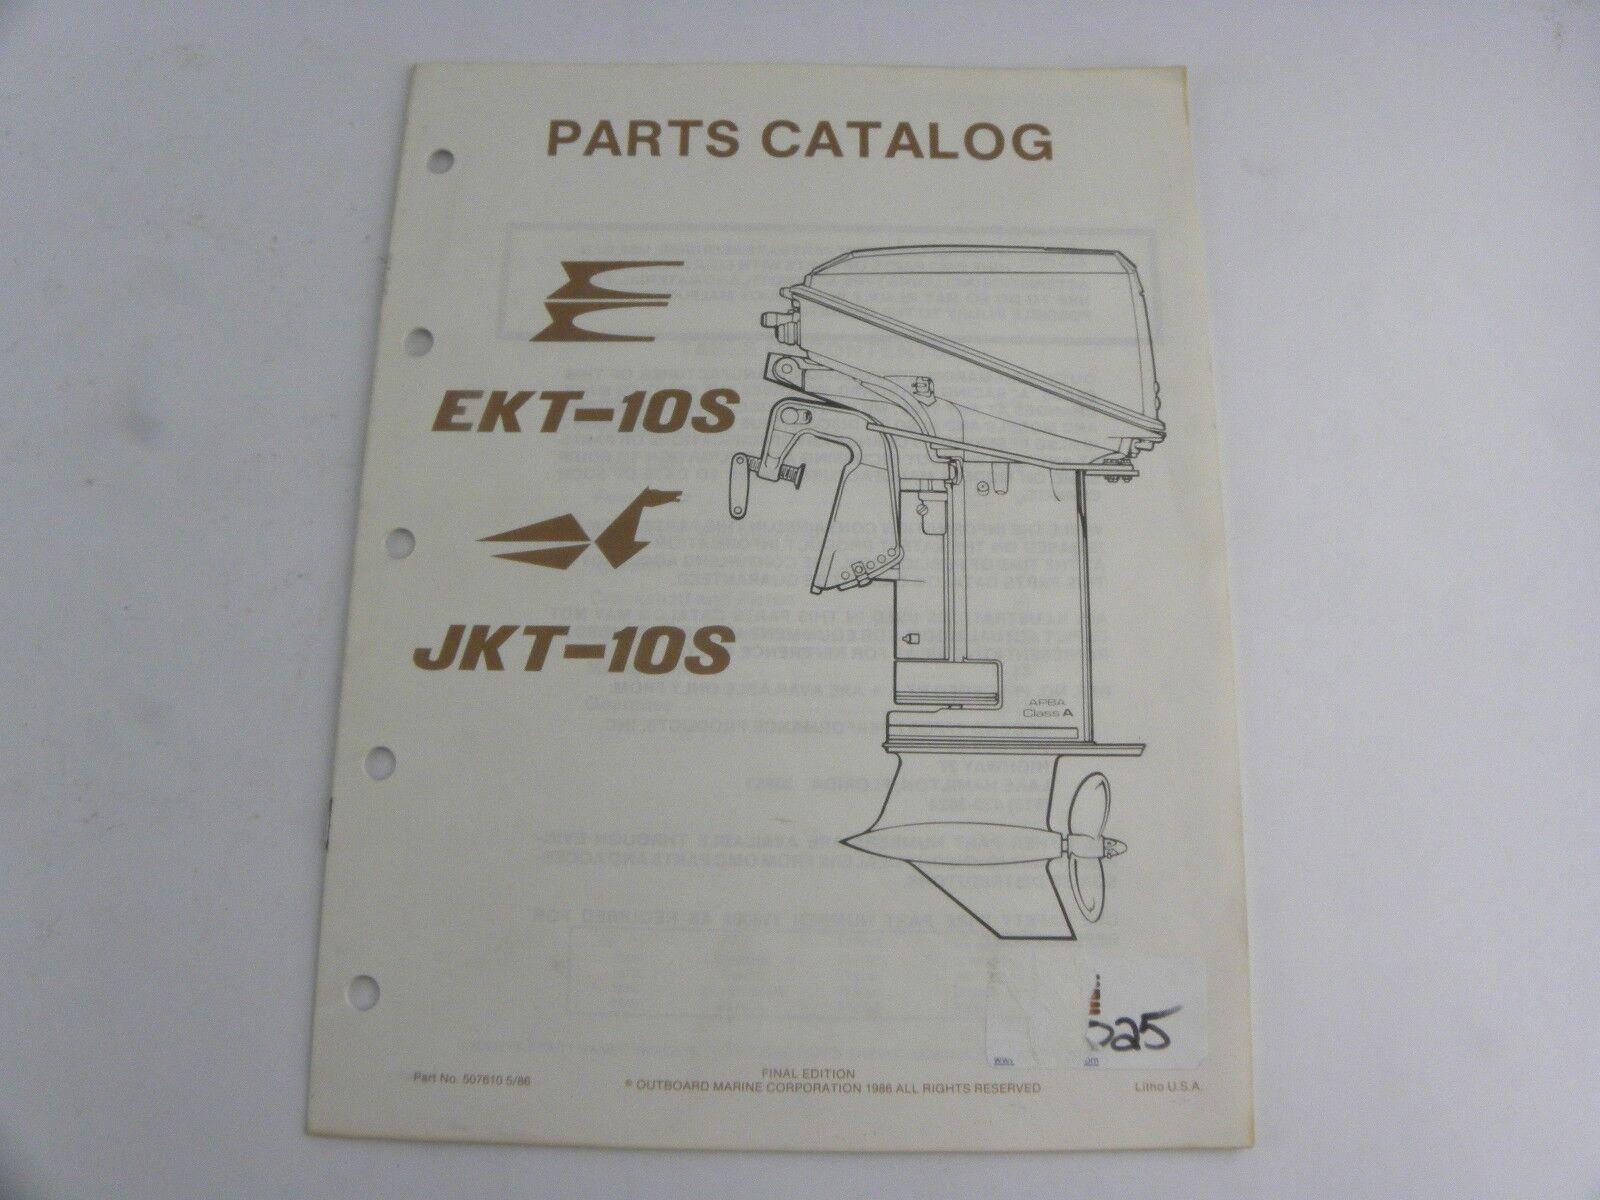 Evinrude Johnson EKT-10S JKT-10S Outboard Motor Parts Catalog Manual 1986 OMC